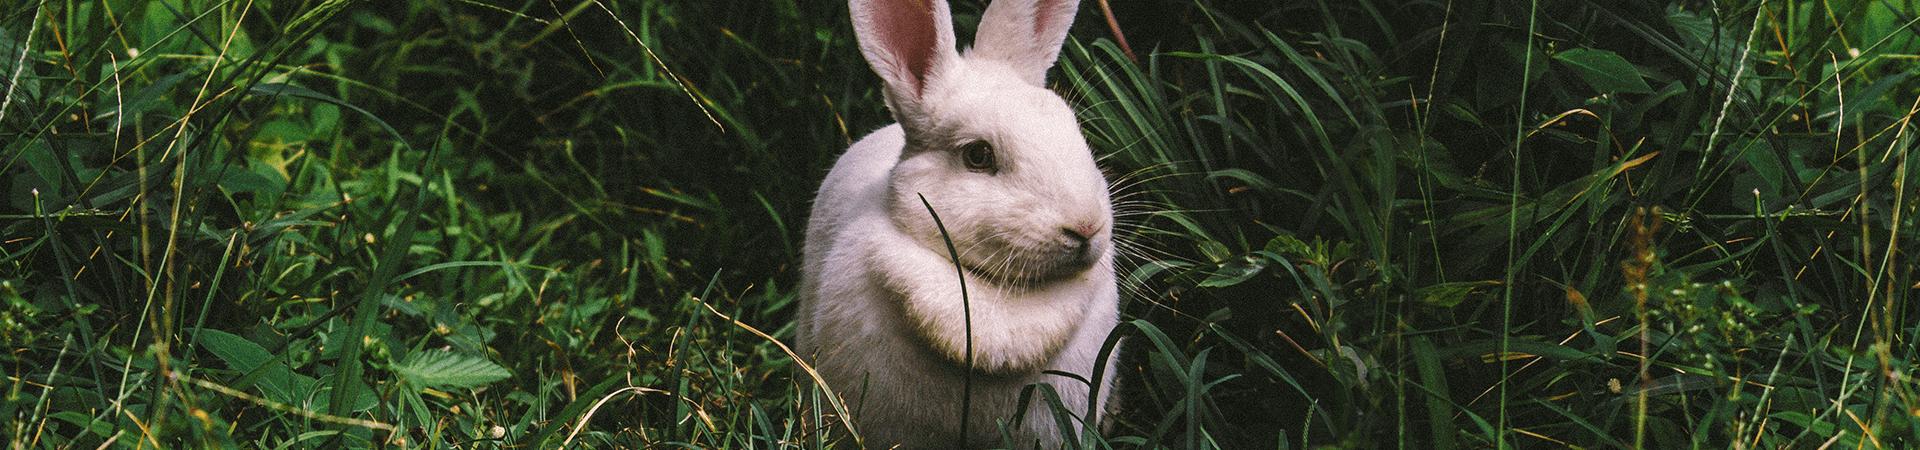 Rabbit insurance